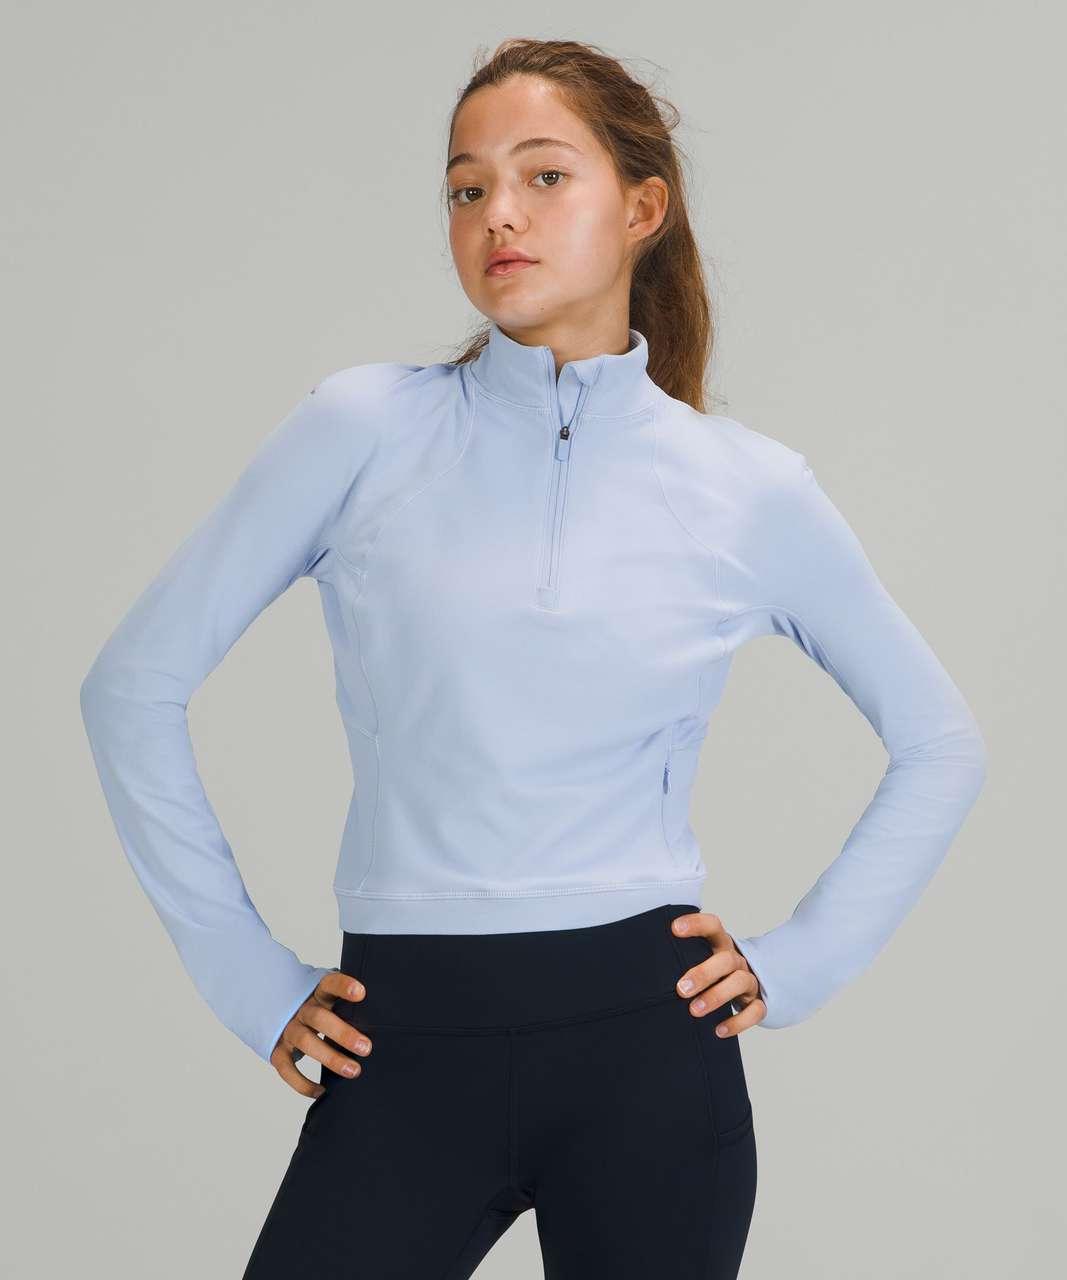 Lululemon Its Rulu Run Cropped Half-Zip - Blue Linen